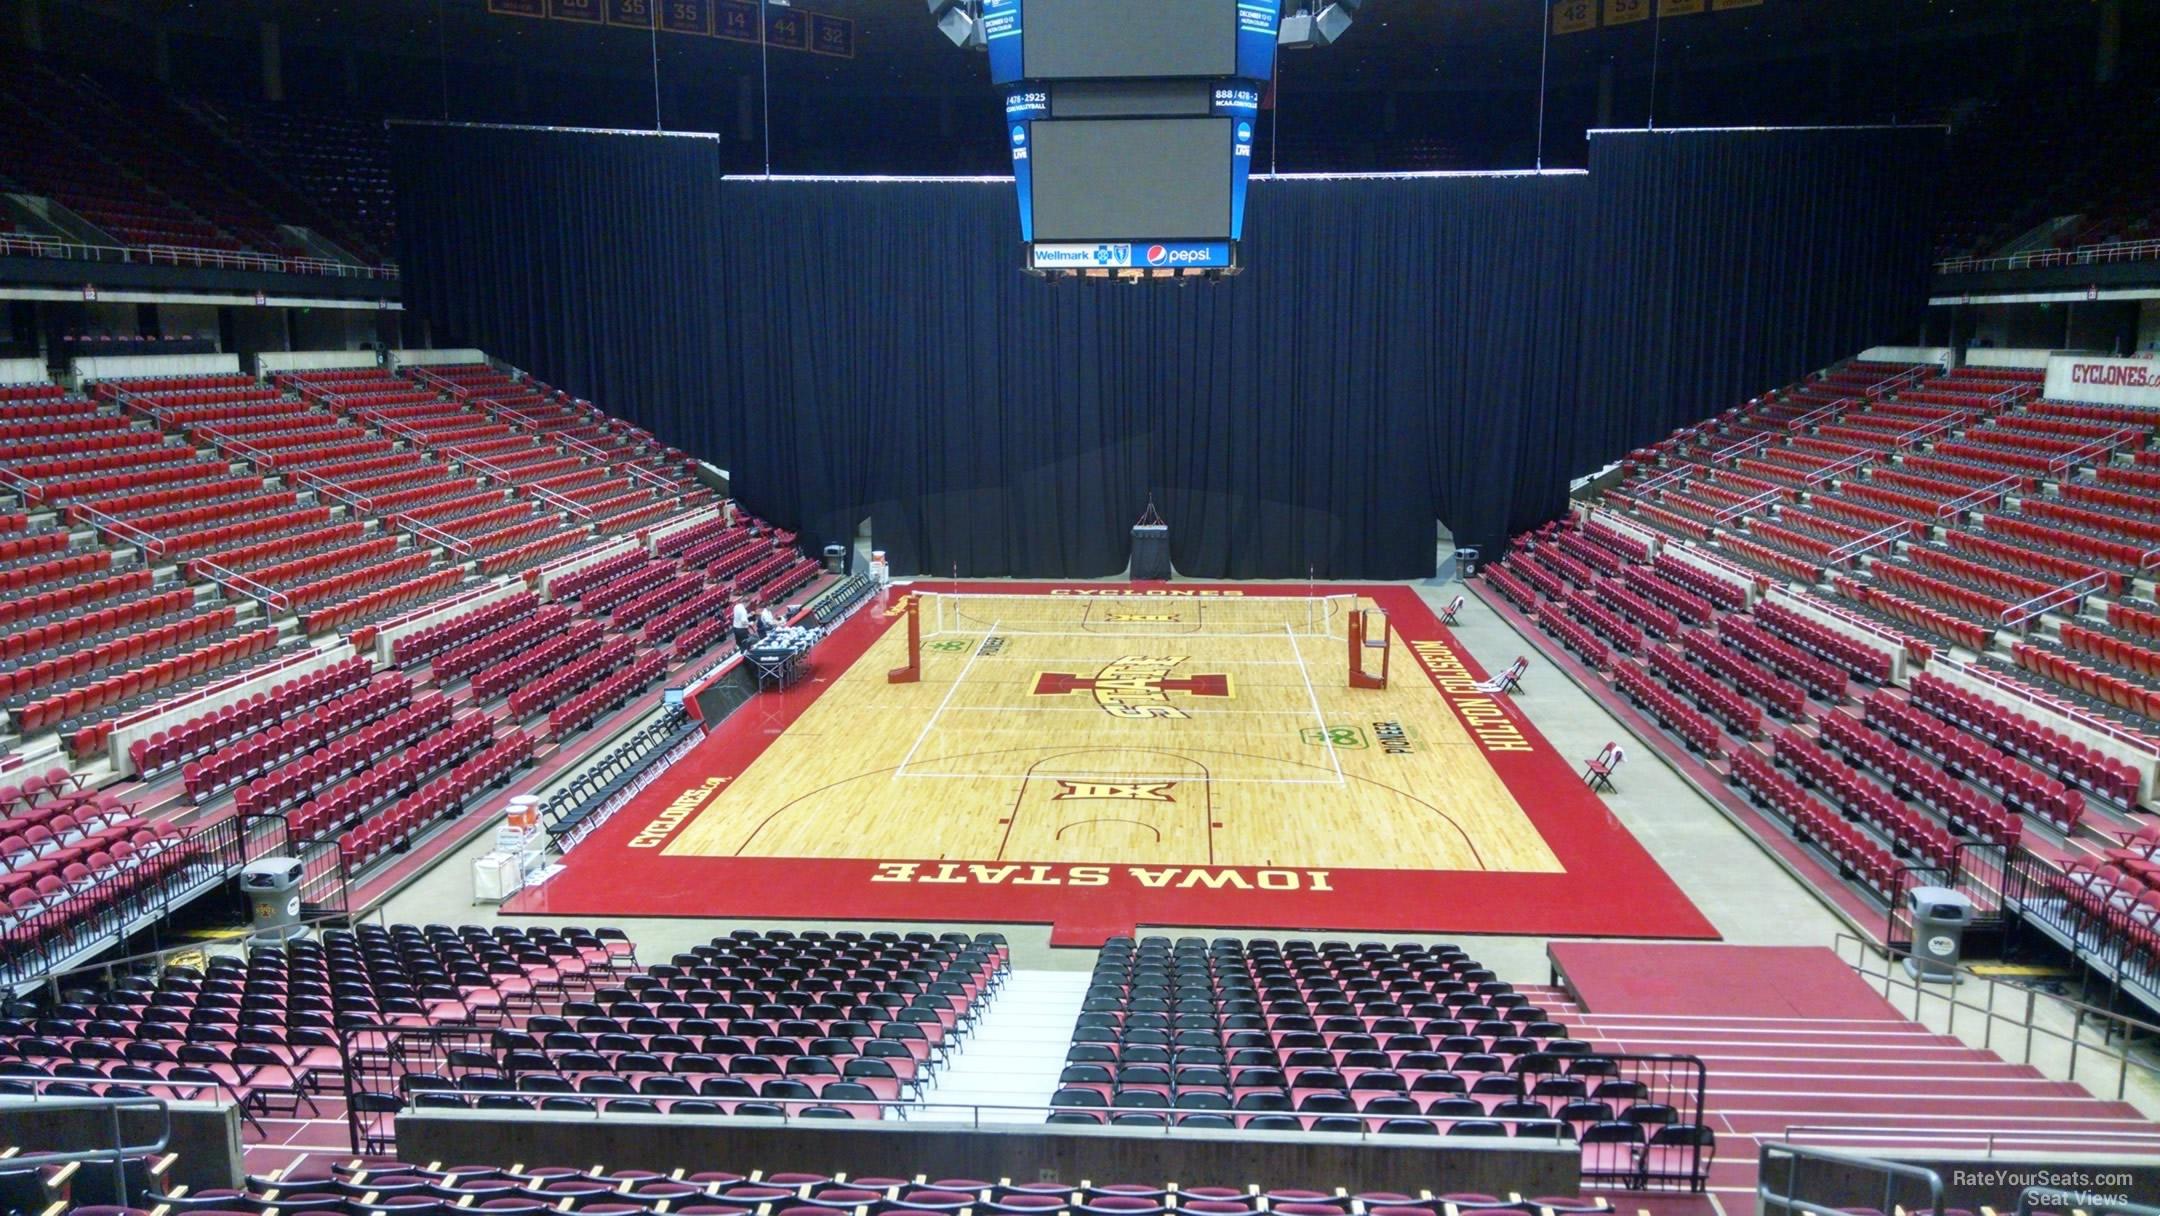 Hilton Coliseum Section 101 Rateyourseatscom